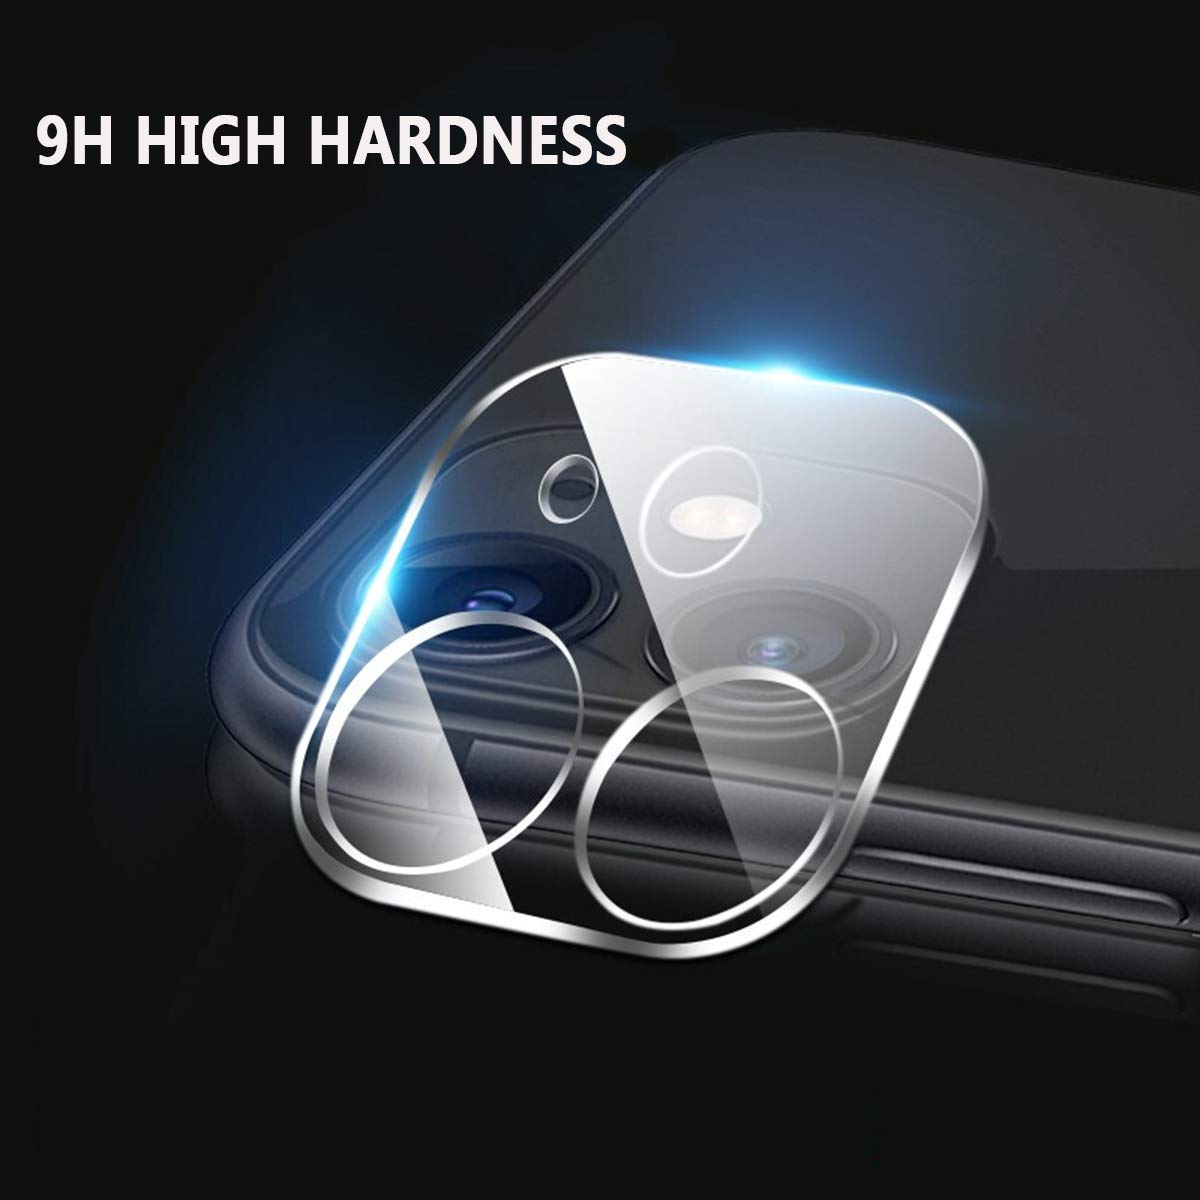 QULLOO Kamera Schutzfolie f/ür iPhone 11 Pro Max//iPhone 11 Pro, Kristallklar Kamera panzerglas Anti-Kratzen Kameraschutz f/ür iPhone 11 Pro Max//iPhone 11 Pro 2 St/ück